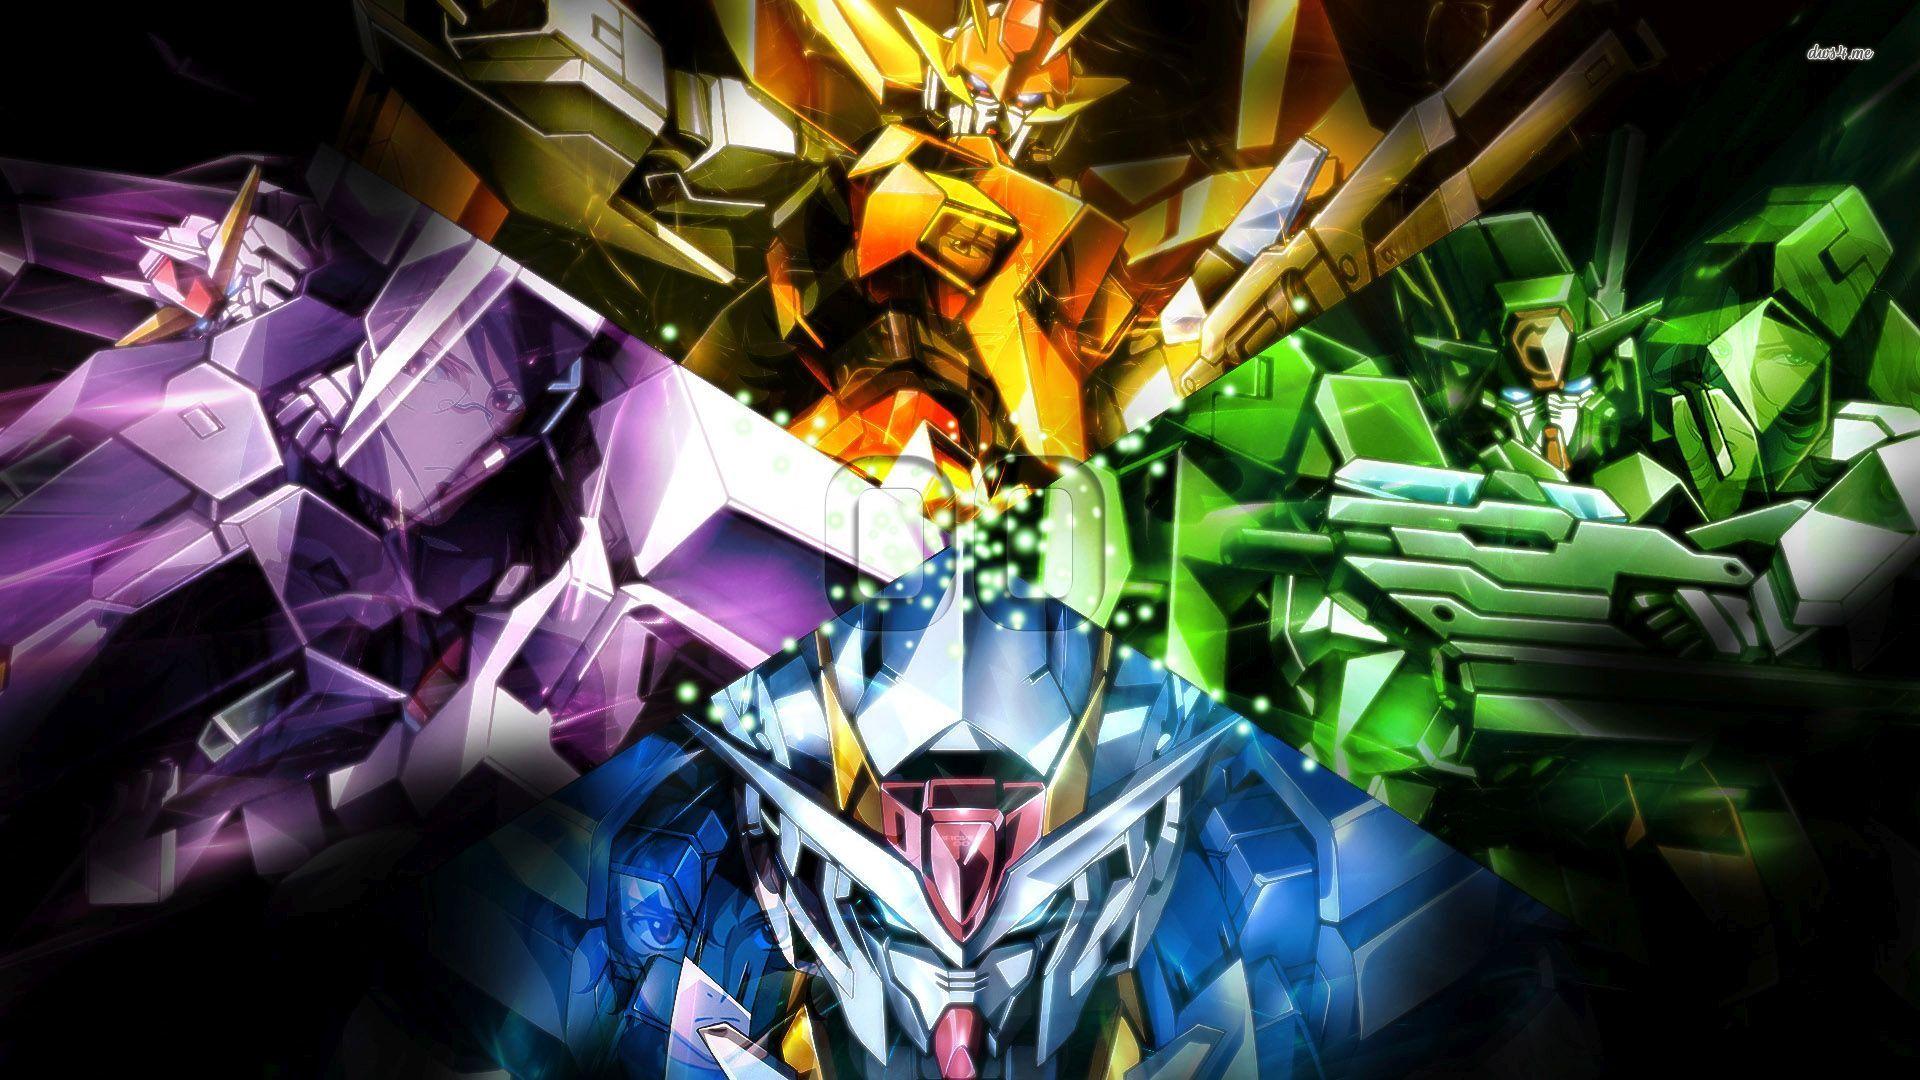 1366x768 Gundam wallpaper 1680x1050 Gundam wallpaper 1920x1080 more 1920x1080